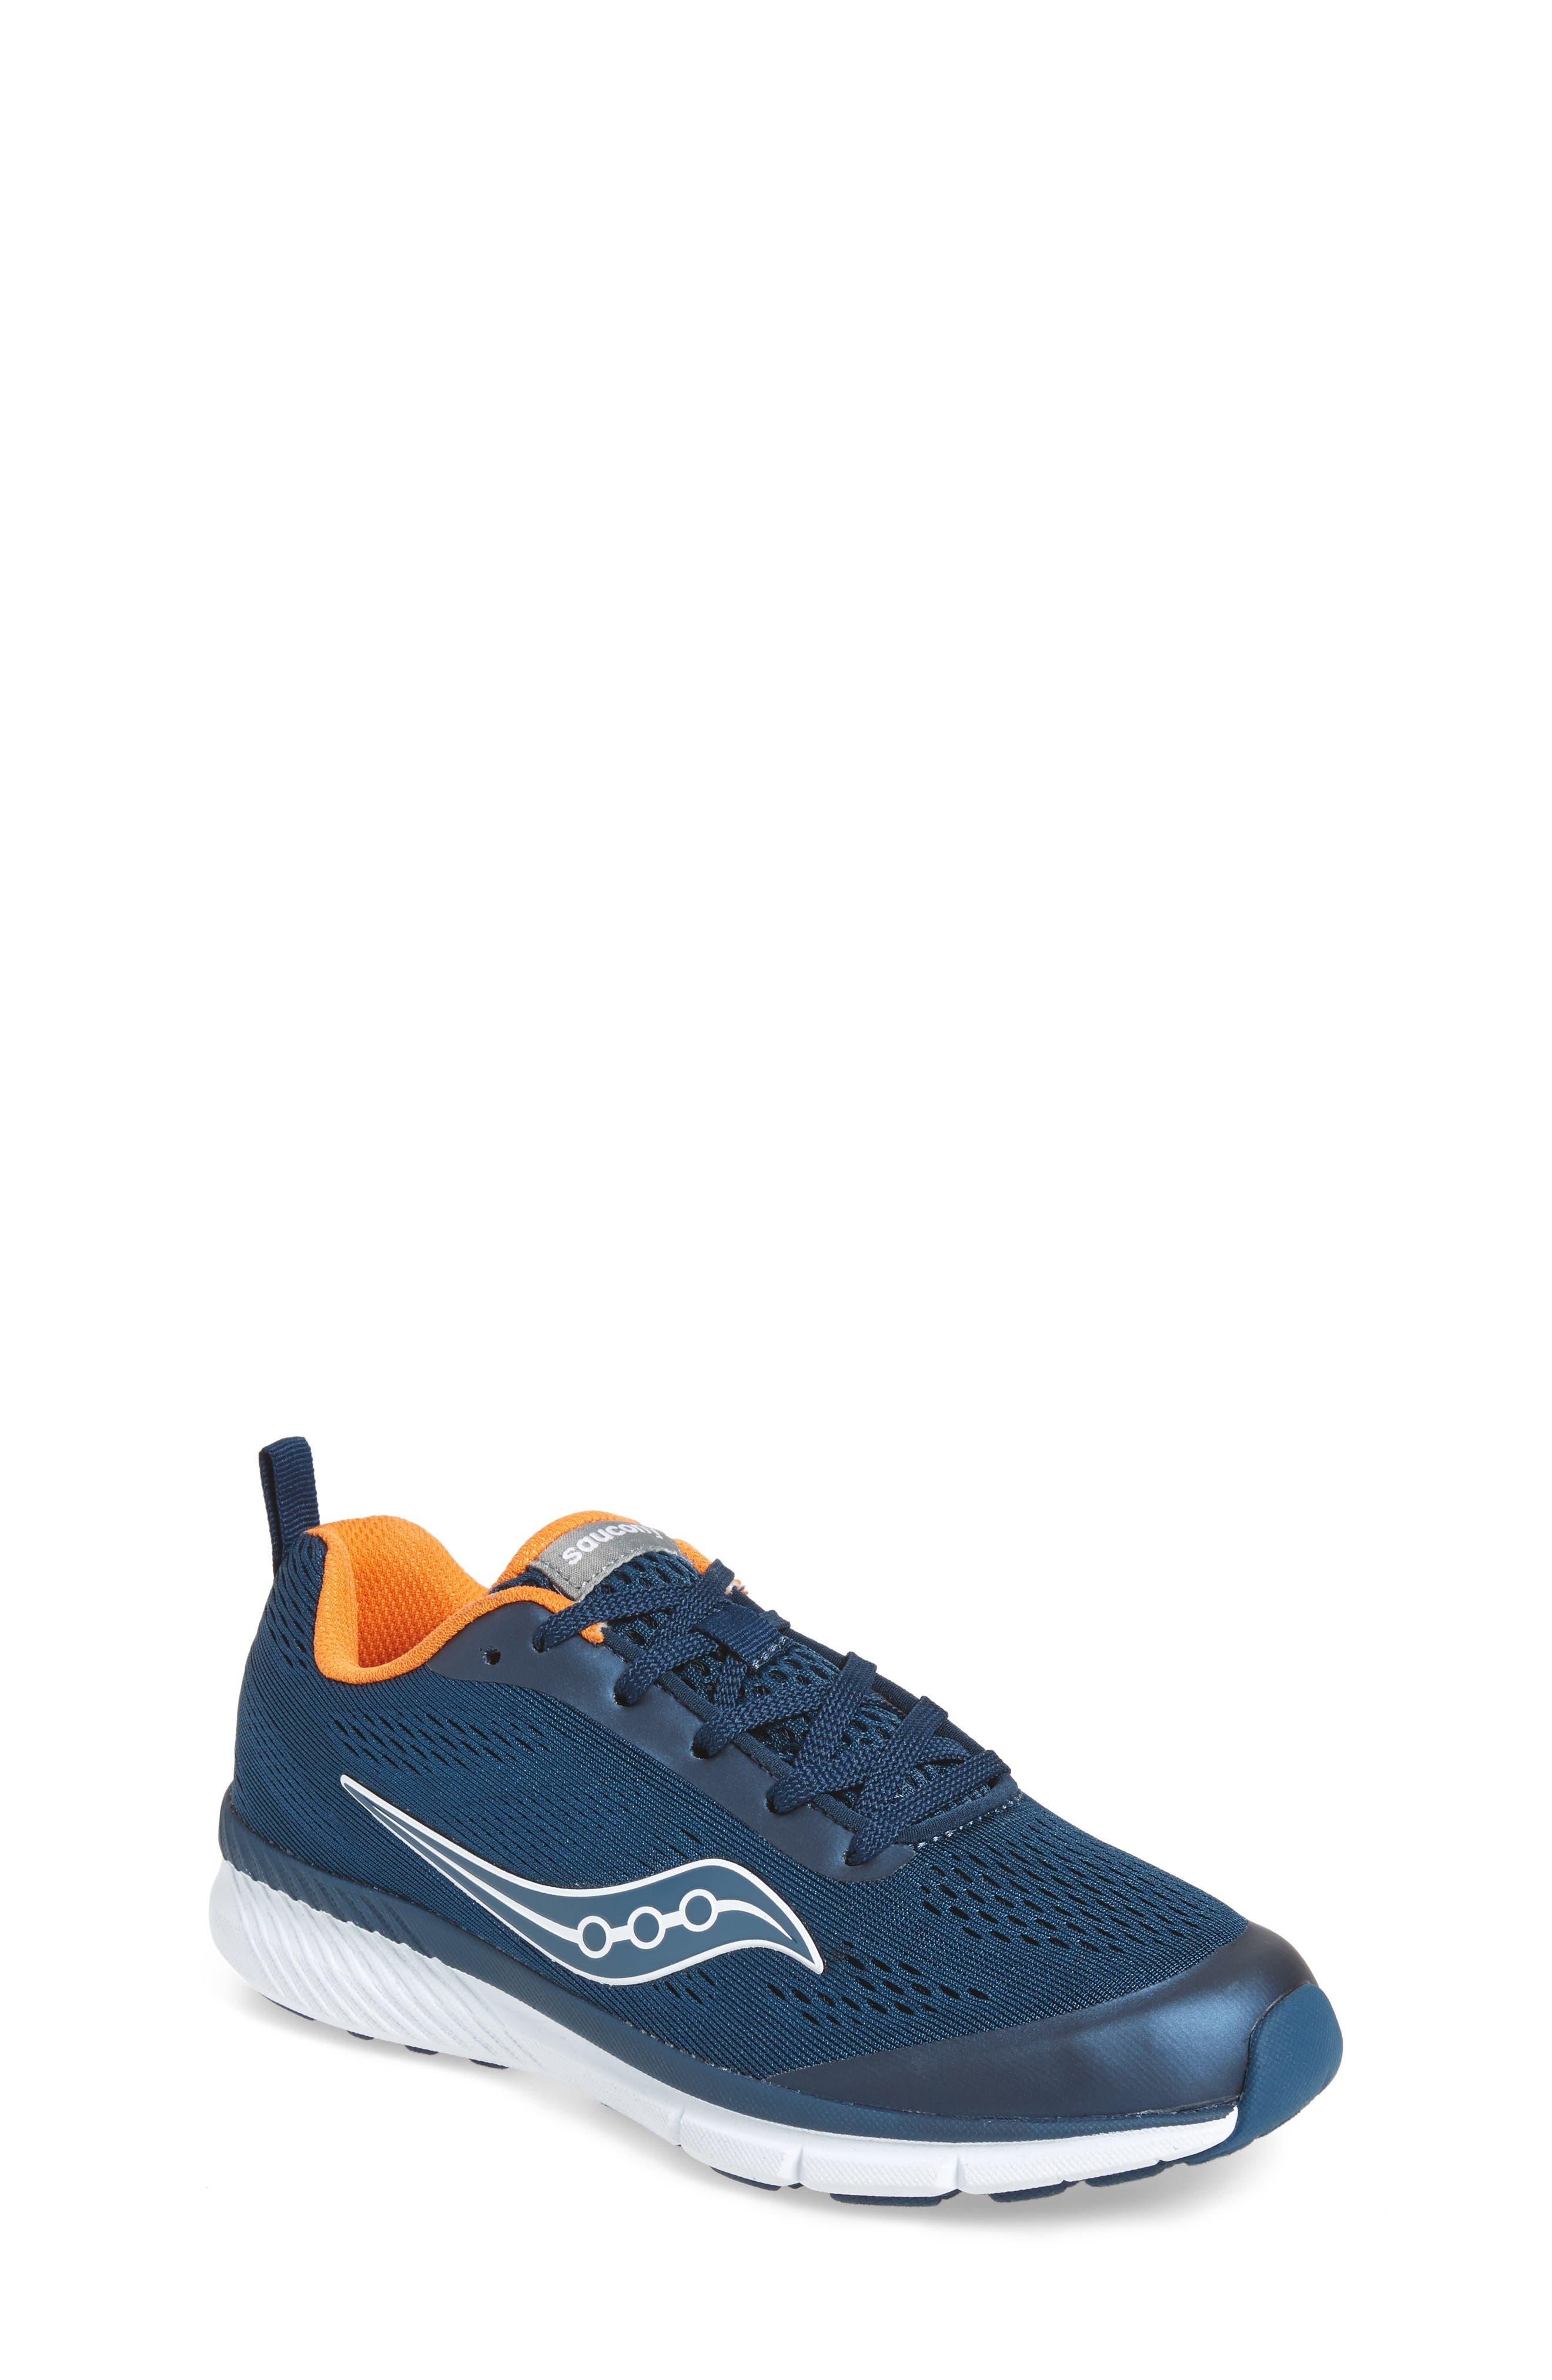 Saucony Ideal Sneaker (Toddler, Little Kid & Big Kid)